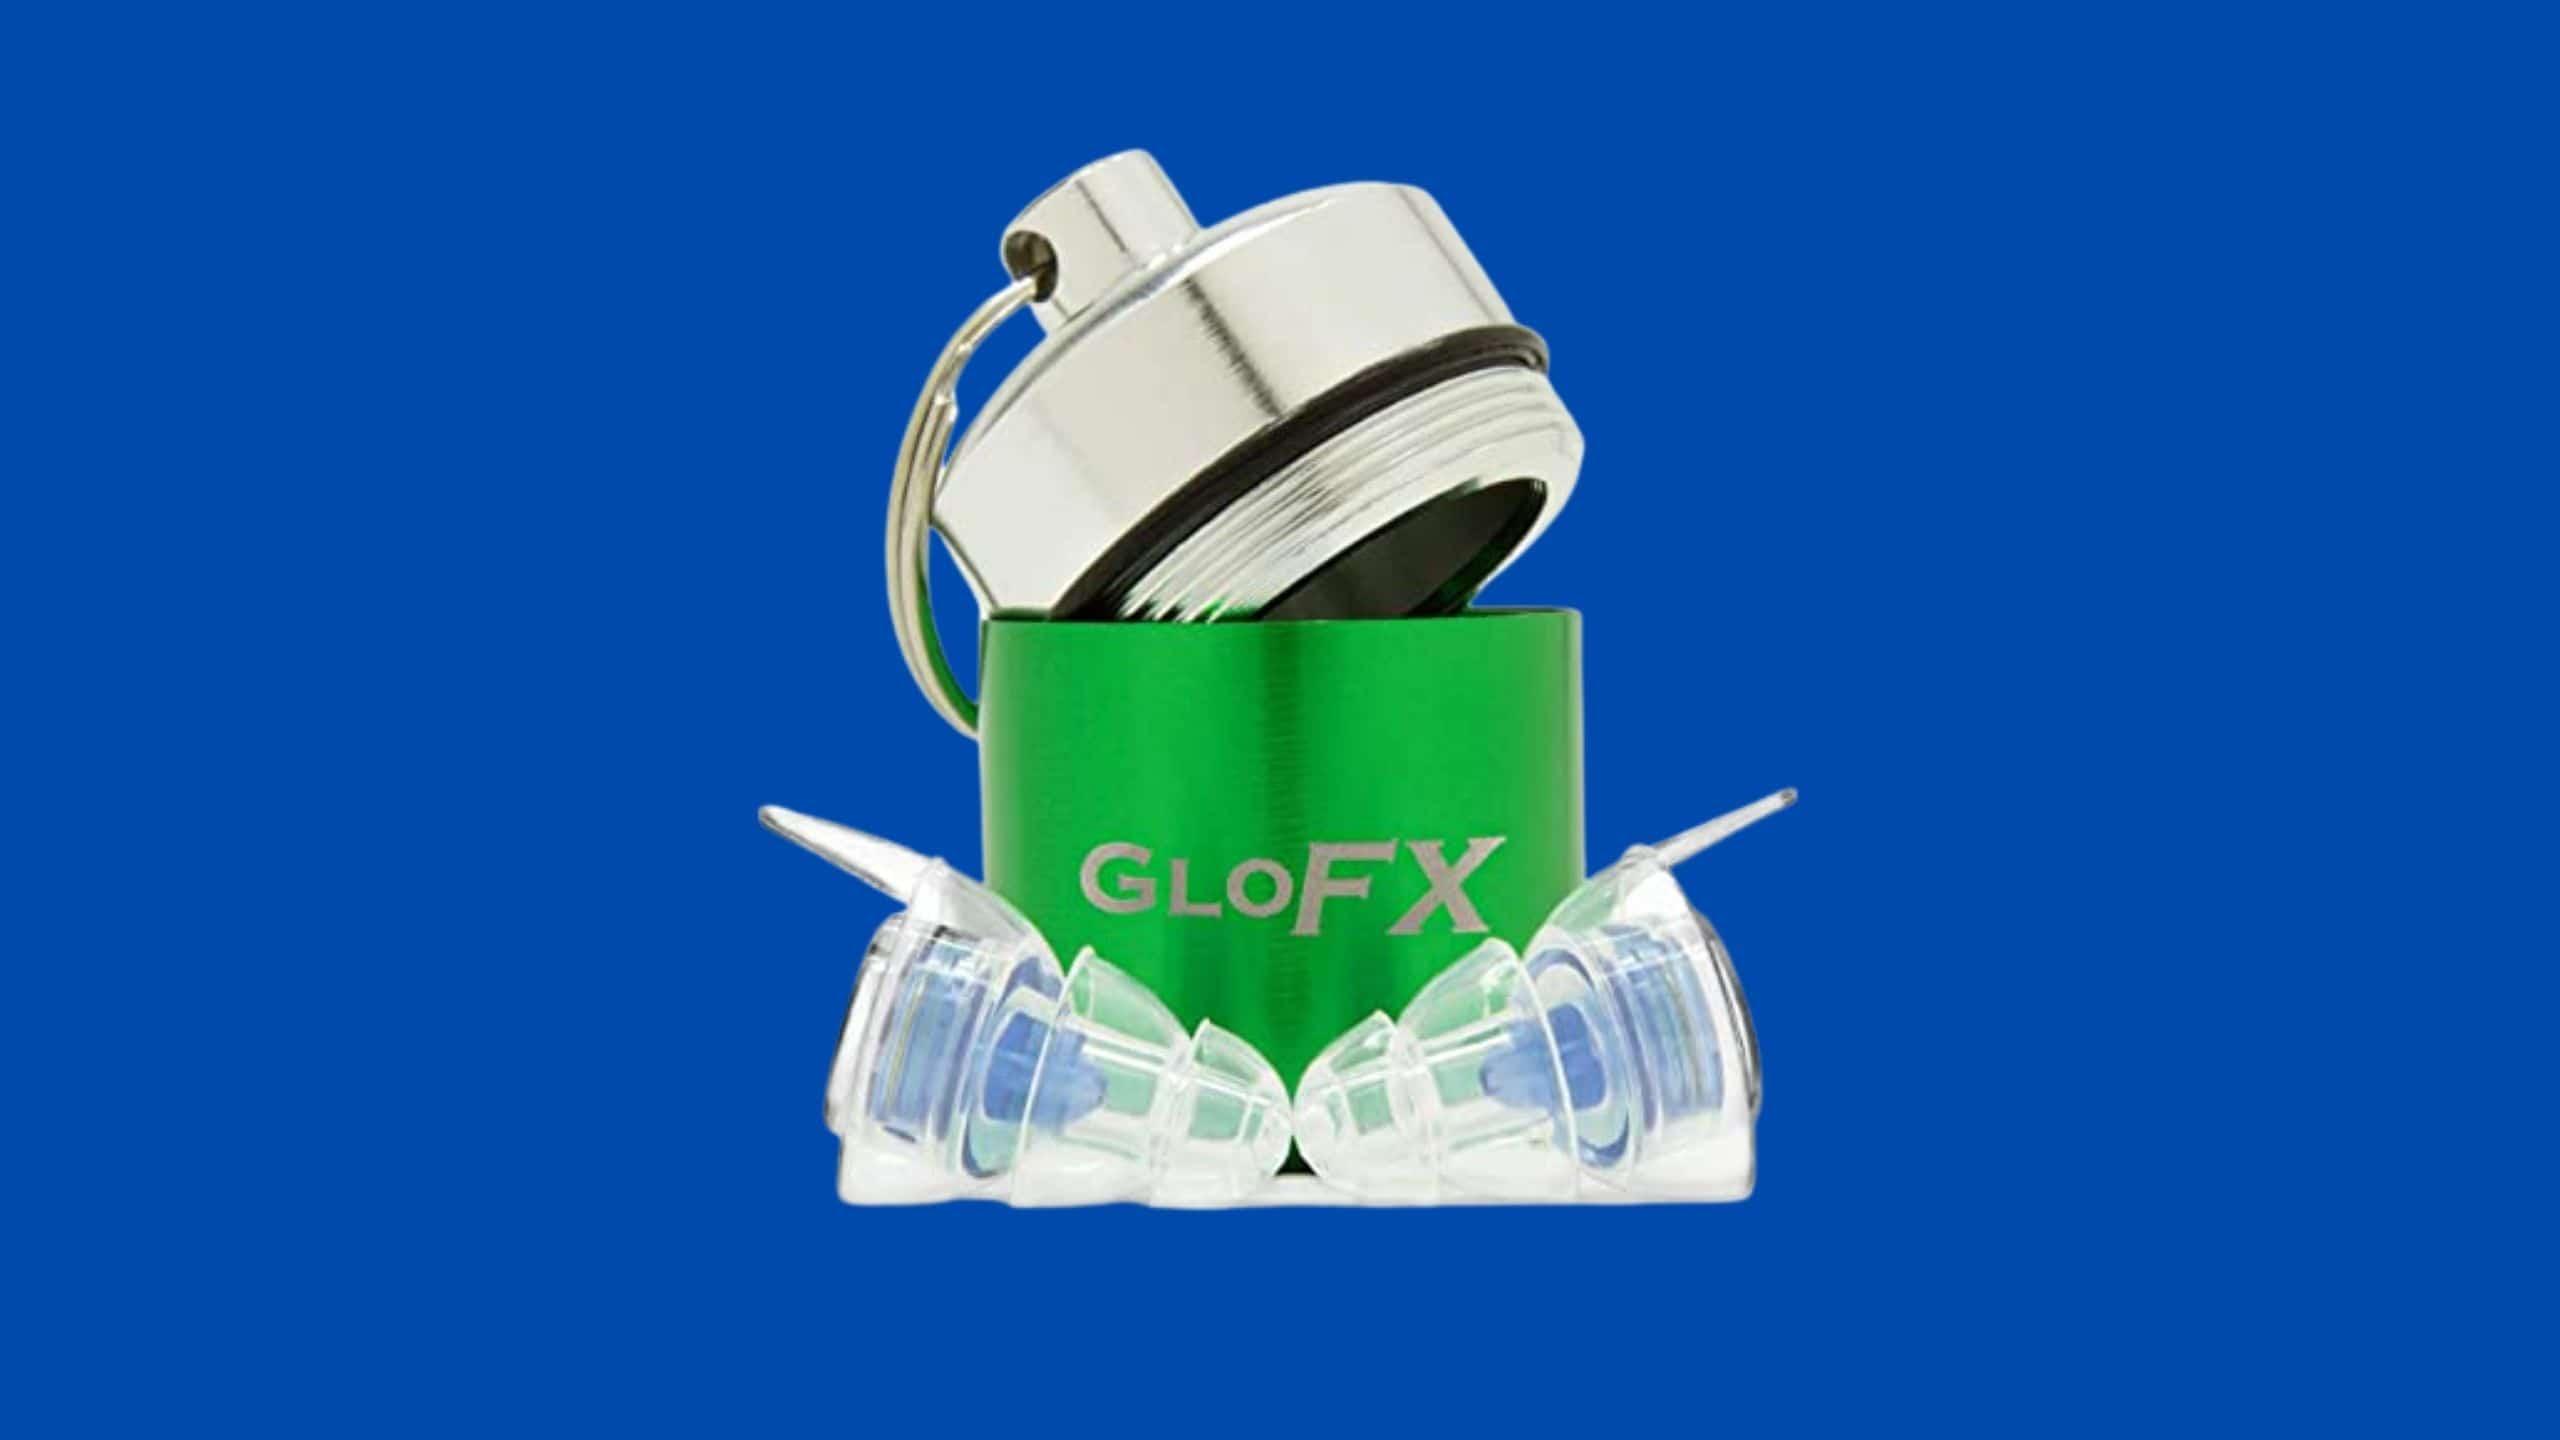 GloFX Earplugs – comfortable hearing protection